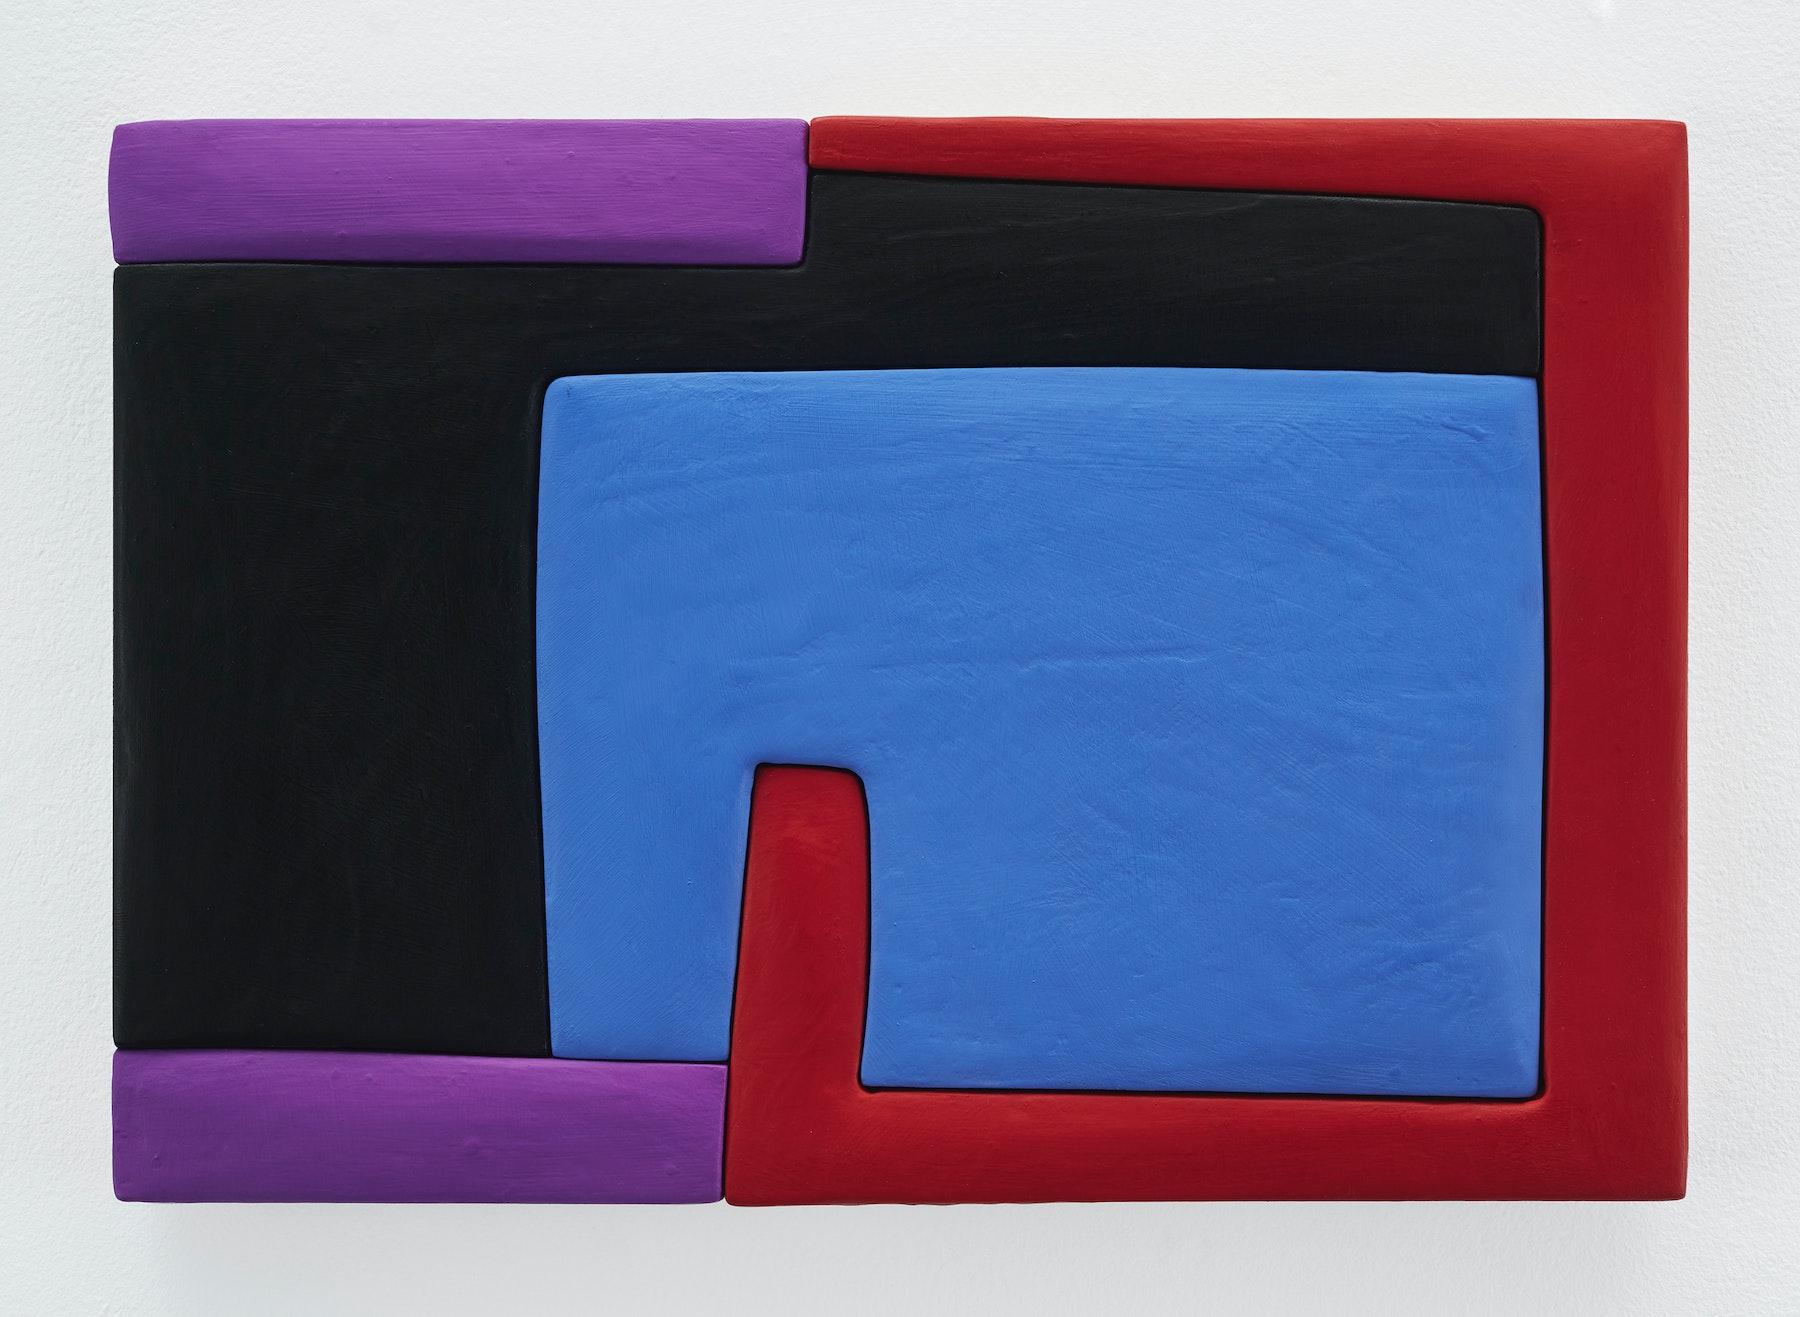 "Sadie Benning ""Untitled 11x16 (ZZ),"" 2019 Wood, aqua resin, casein, and acrylic gouache 11 x 16"" [HxW] (27.94 x 40.64 cm) Inventory #BEN853 Courtesy of the artist and Vielmetter Los Angeles Photocredit: Chris Austin"